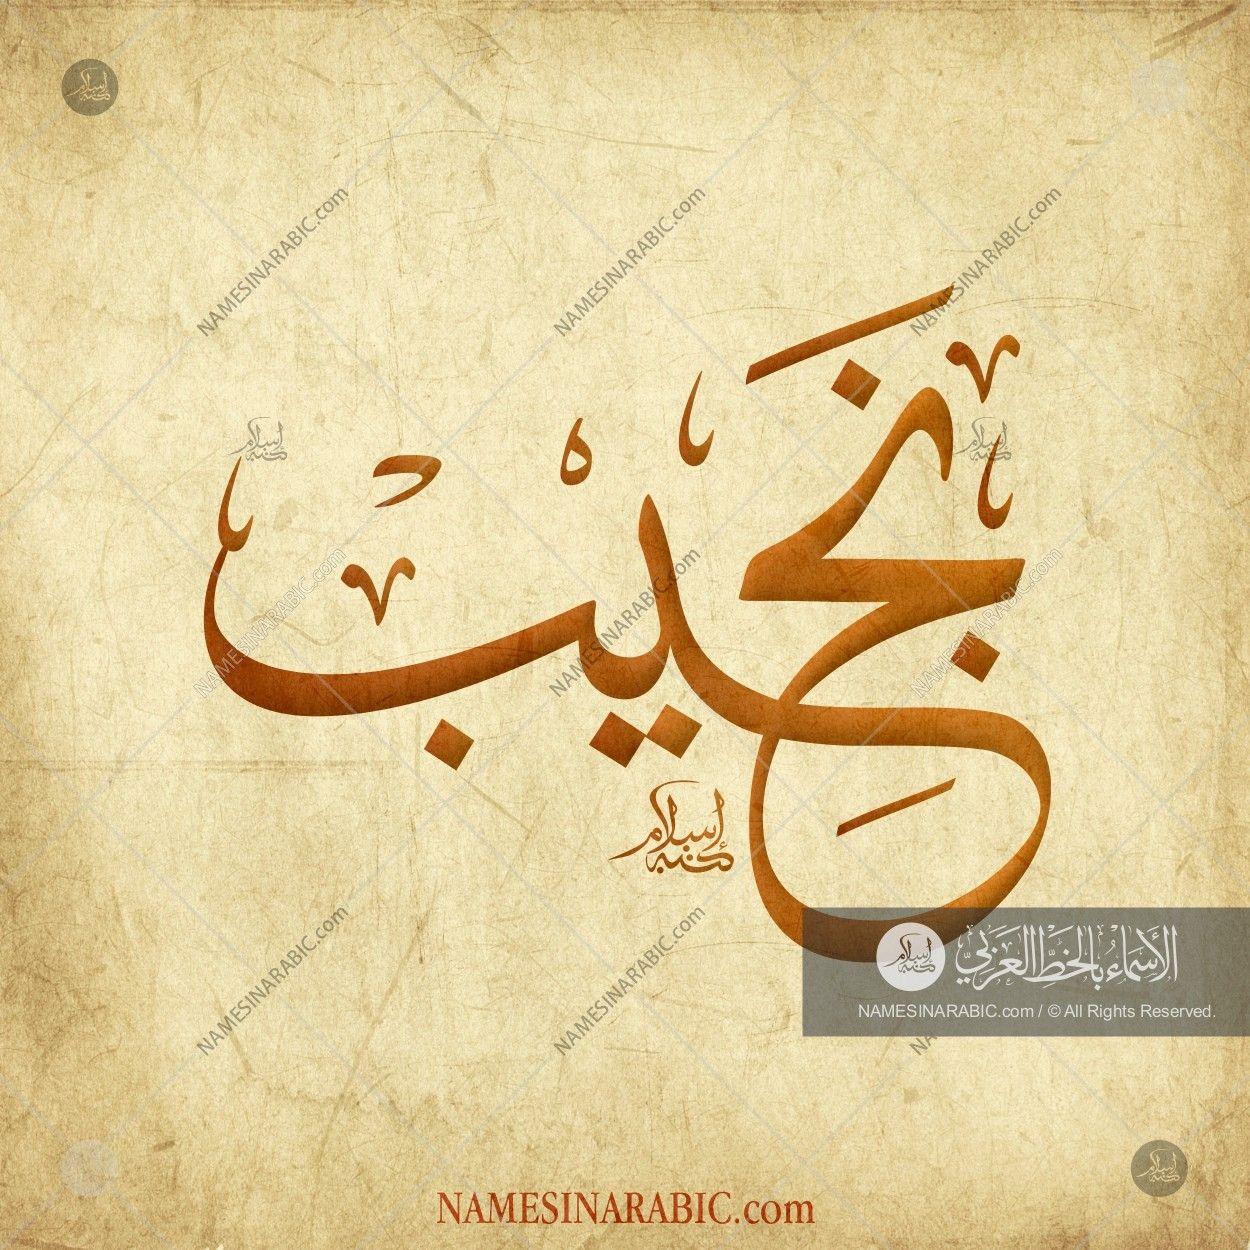 Najeeb نجيب Names In Arabic Calligraphy Name 3559 Calligraphy Name Calligraphy Arabic Calligraphy Art